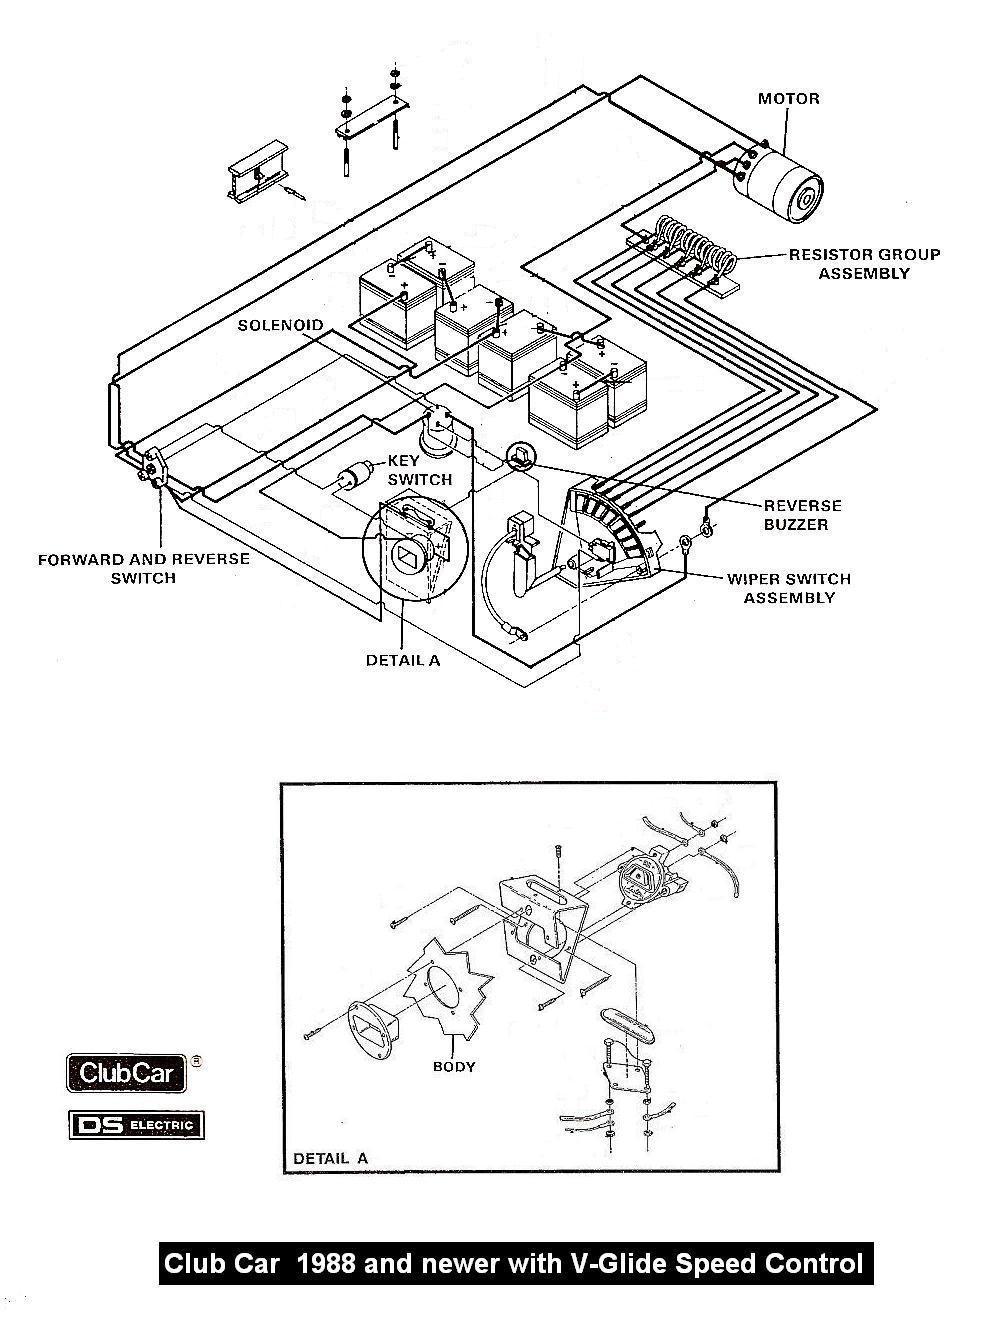 1988 Club Car 48v Wiring Diagram - WIRE Center •